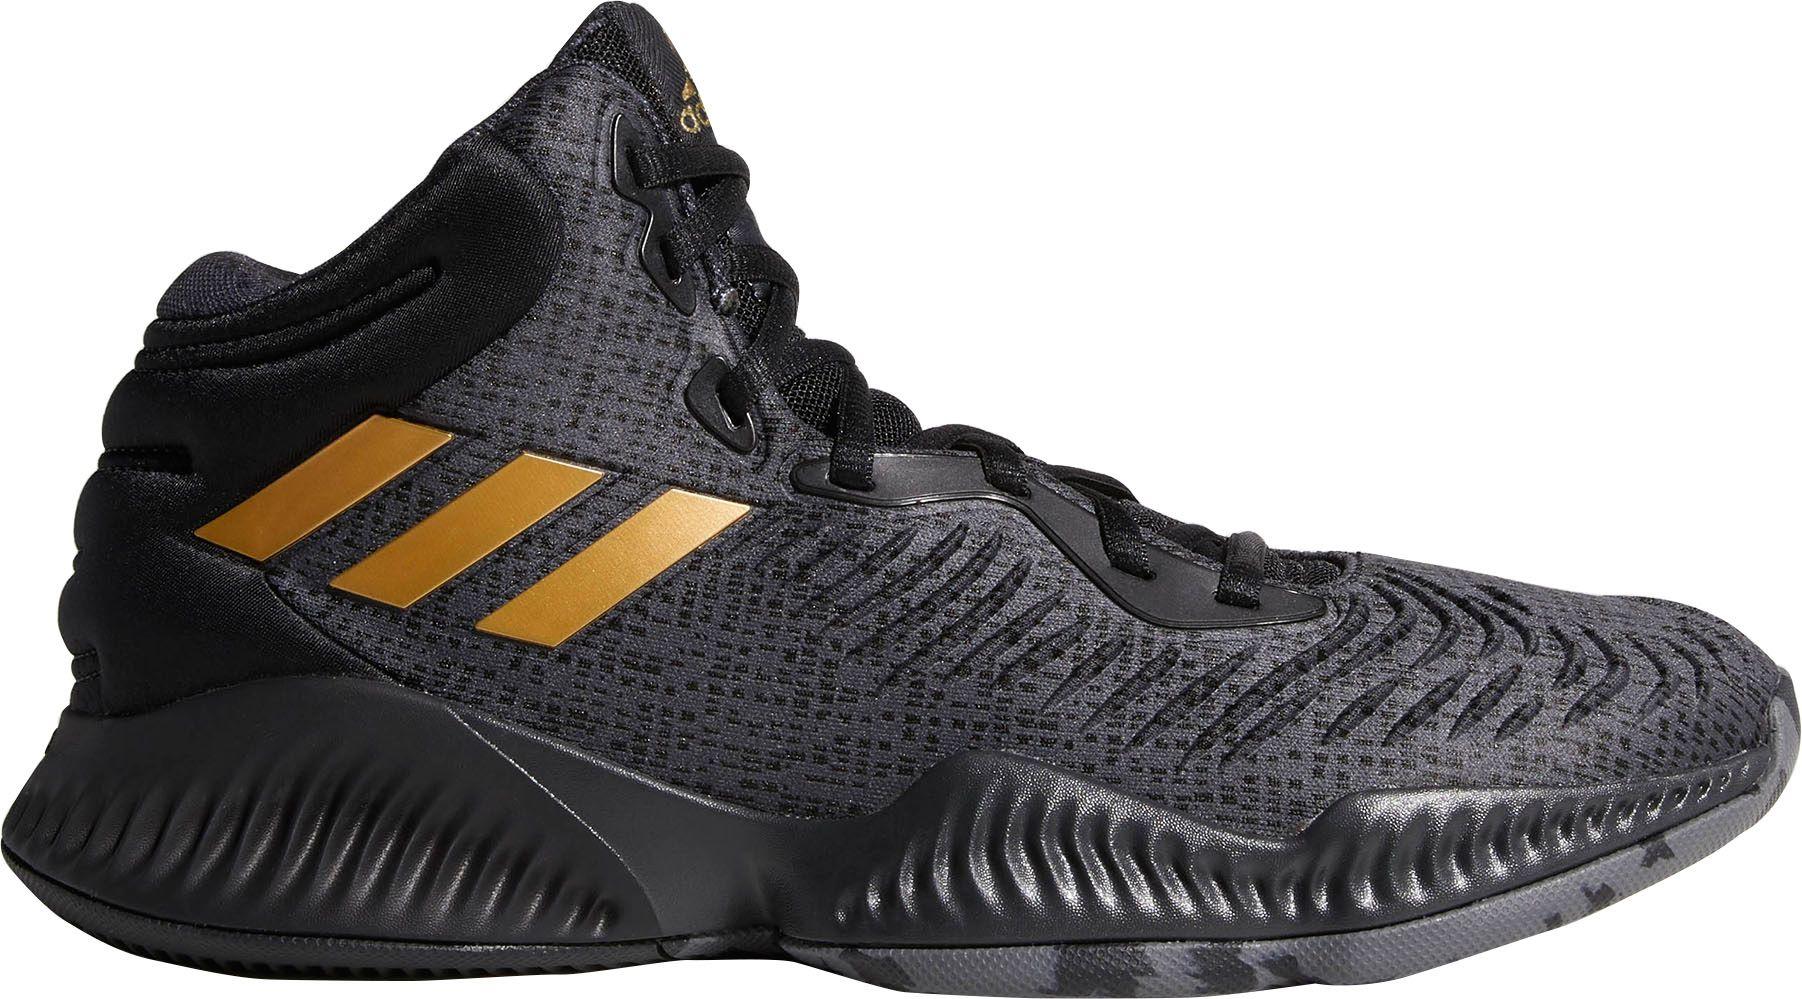 35fdc503636 adidas Men u0027s Mad Bounce 2018 Basketball Shoes